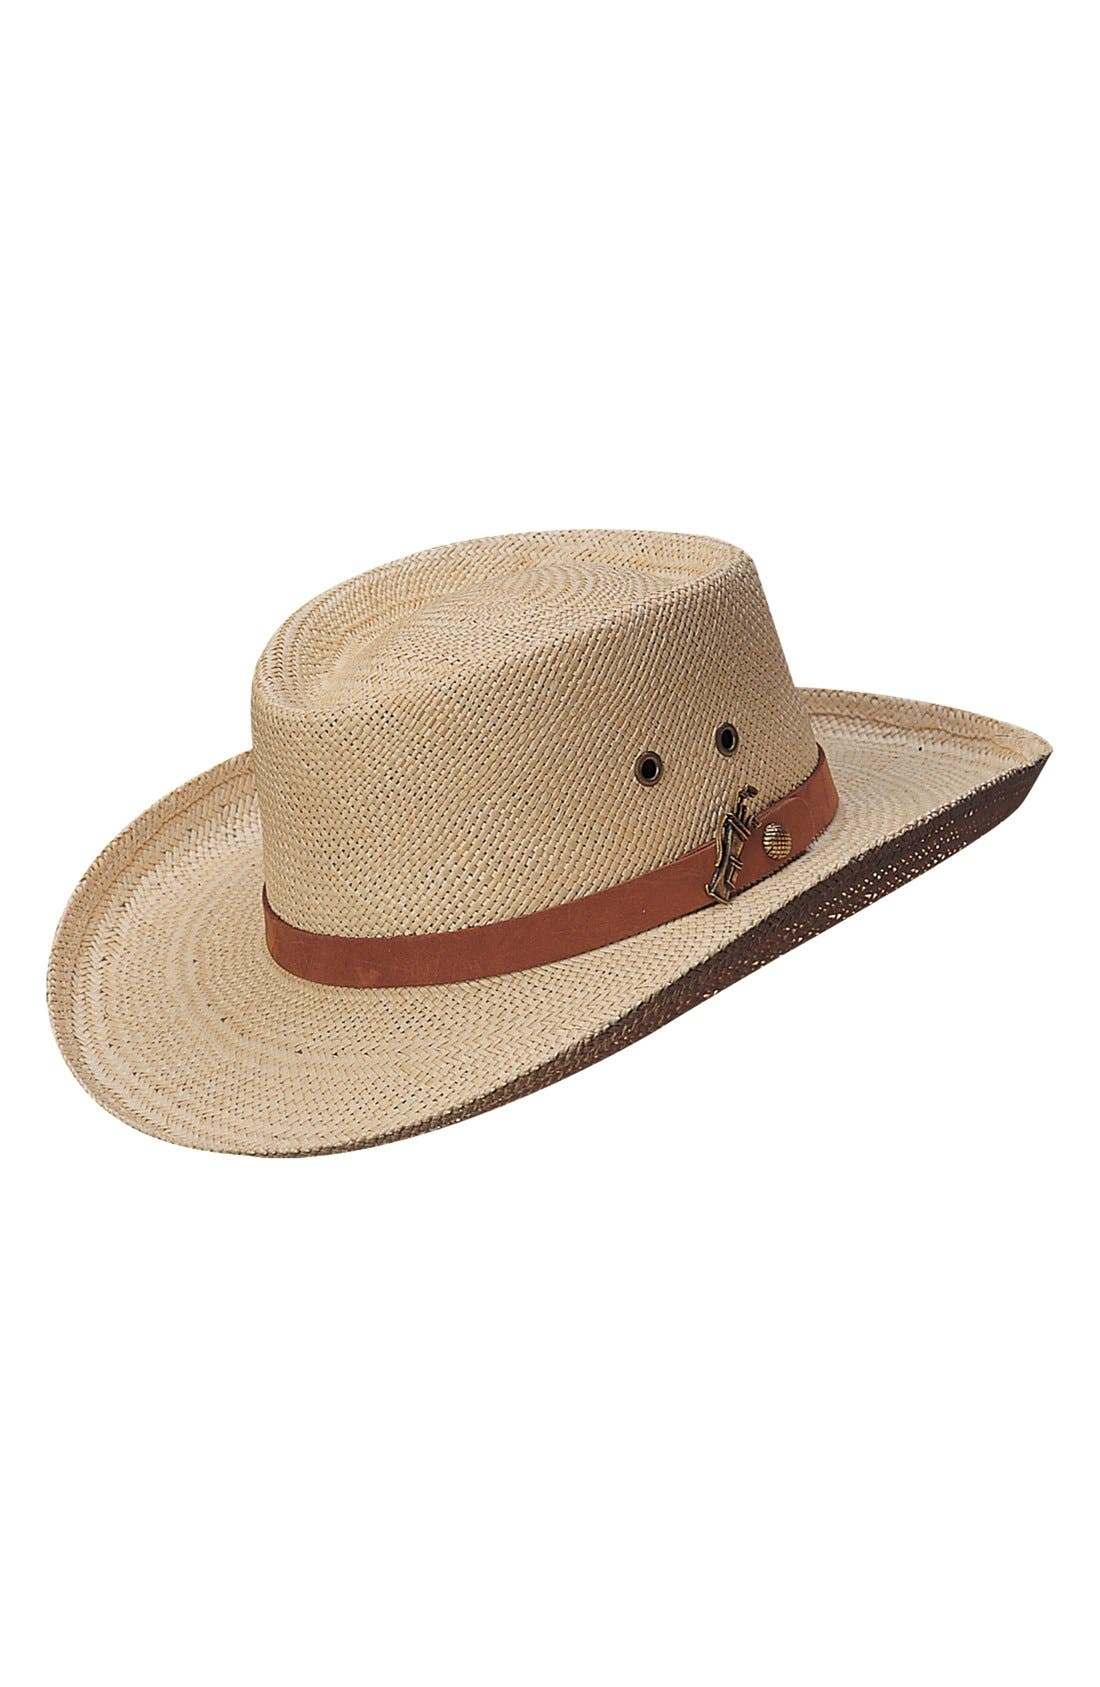 Palm Gambler Hat,                         Main,                         color, NATURAL